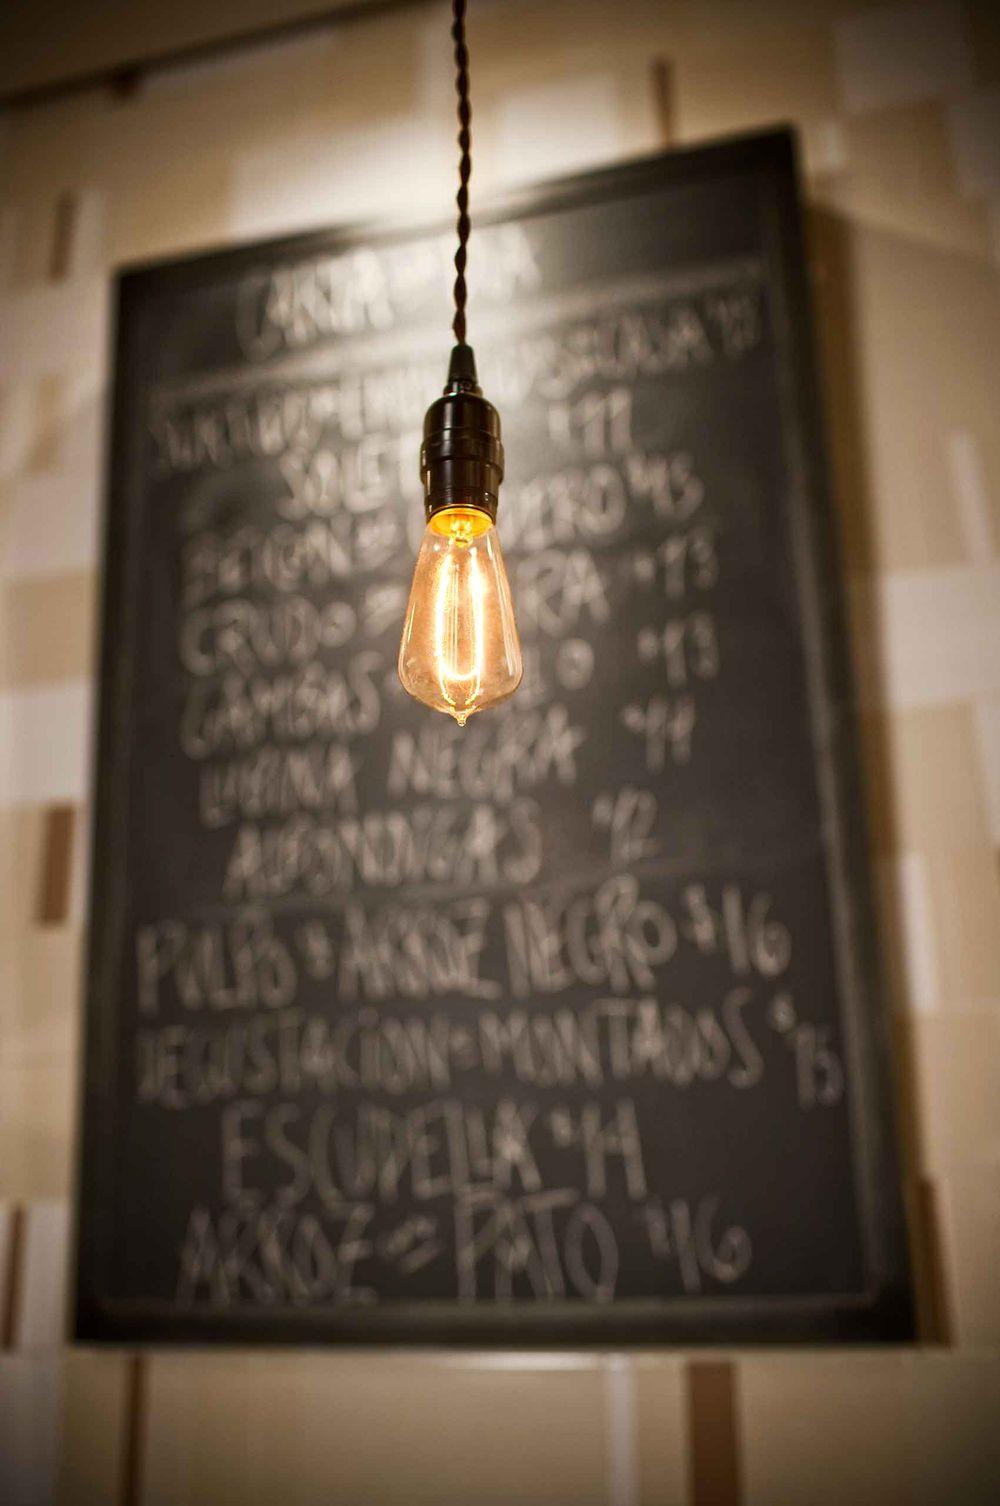 Bulb-blackboard-RestaurantInterior-by-HenrikOlundPhotography.jpg